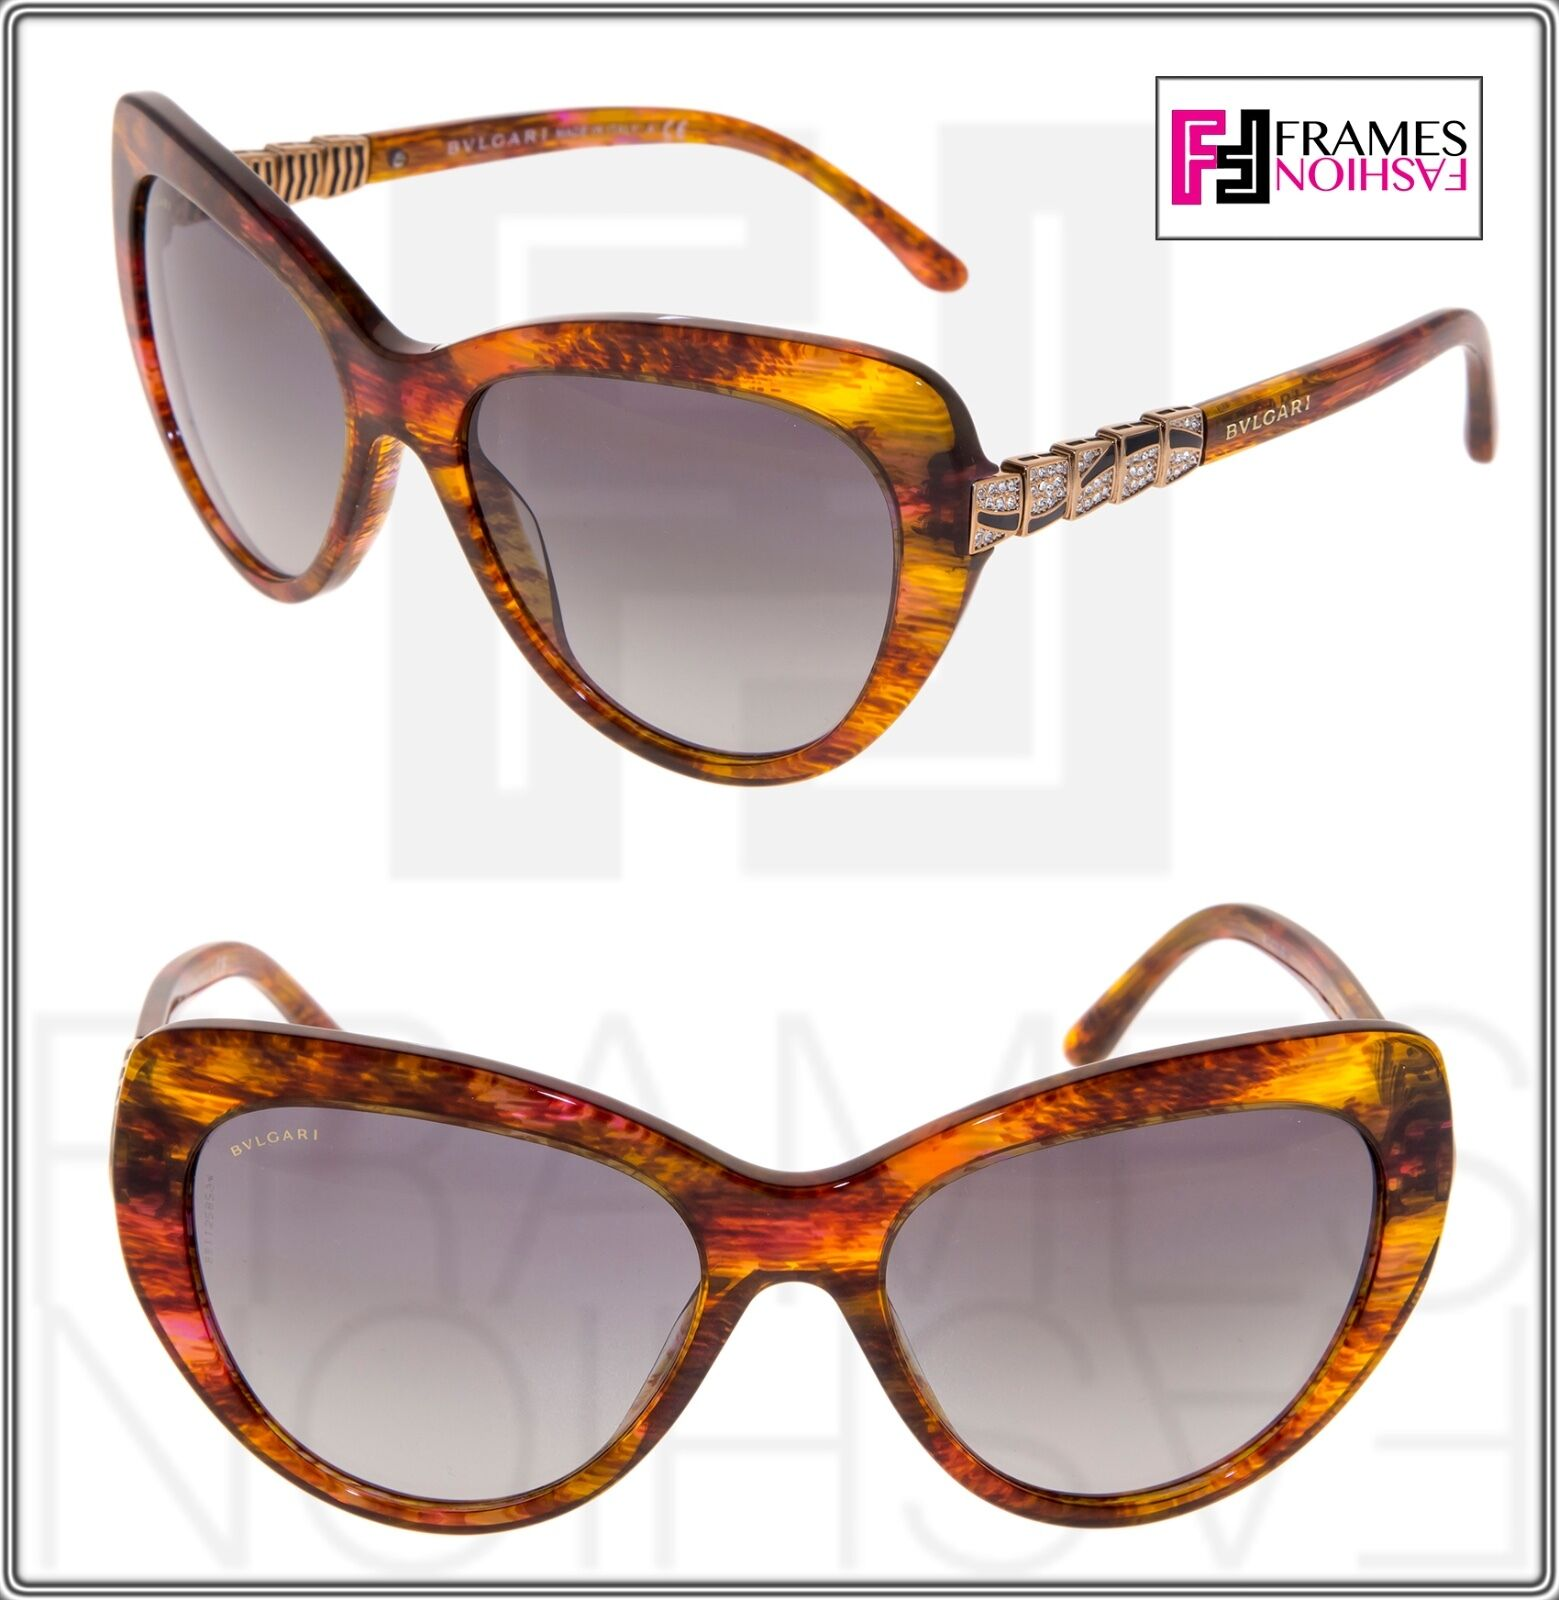 BVLGARI Serpenti BV8143B 5341/11 Orange Red Fantasy Gold Sunglasses 8143 Cat Eye